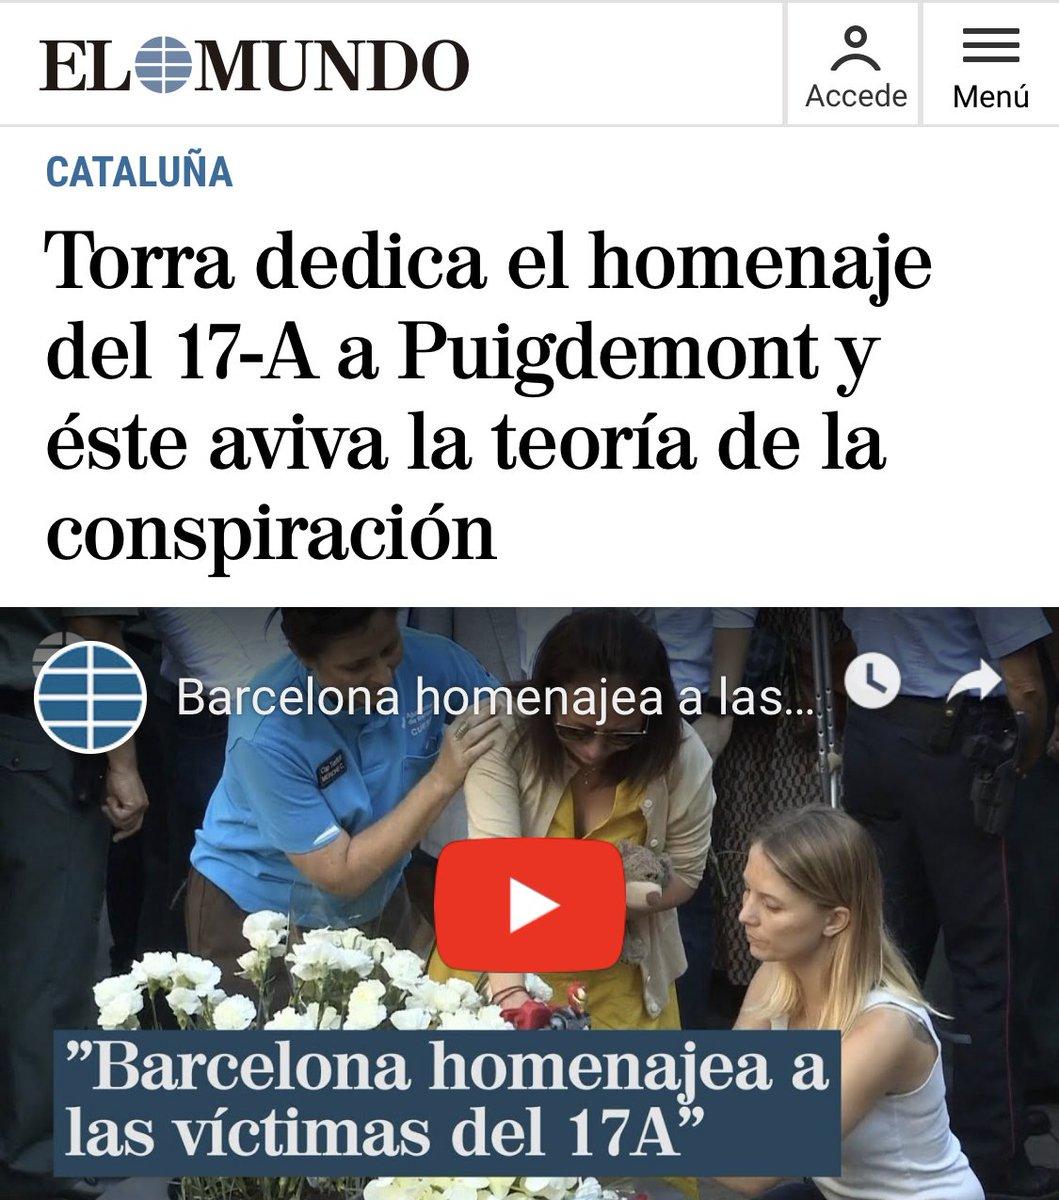 RT @rosadiezglez: Torra y Puigdemont, ni respeto ni vergüenza. https://t.co/nj5rFHPluj